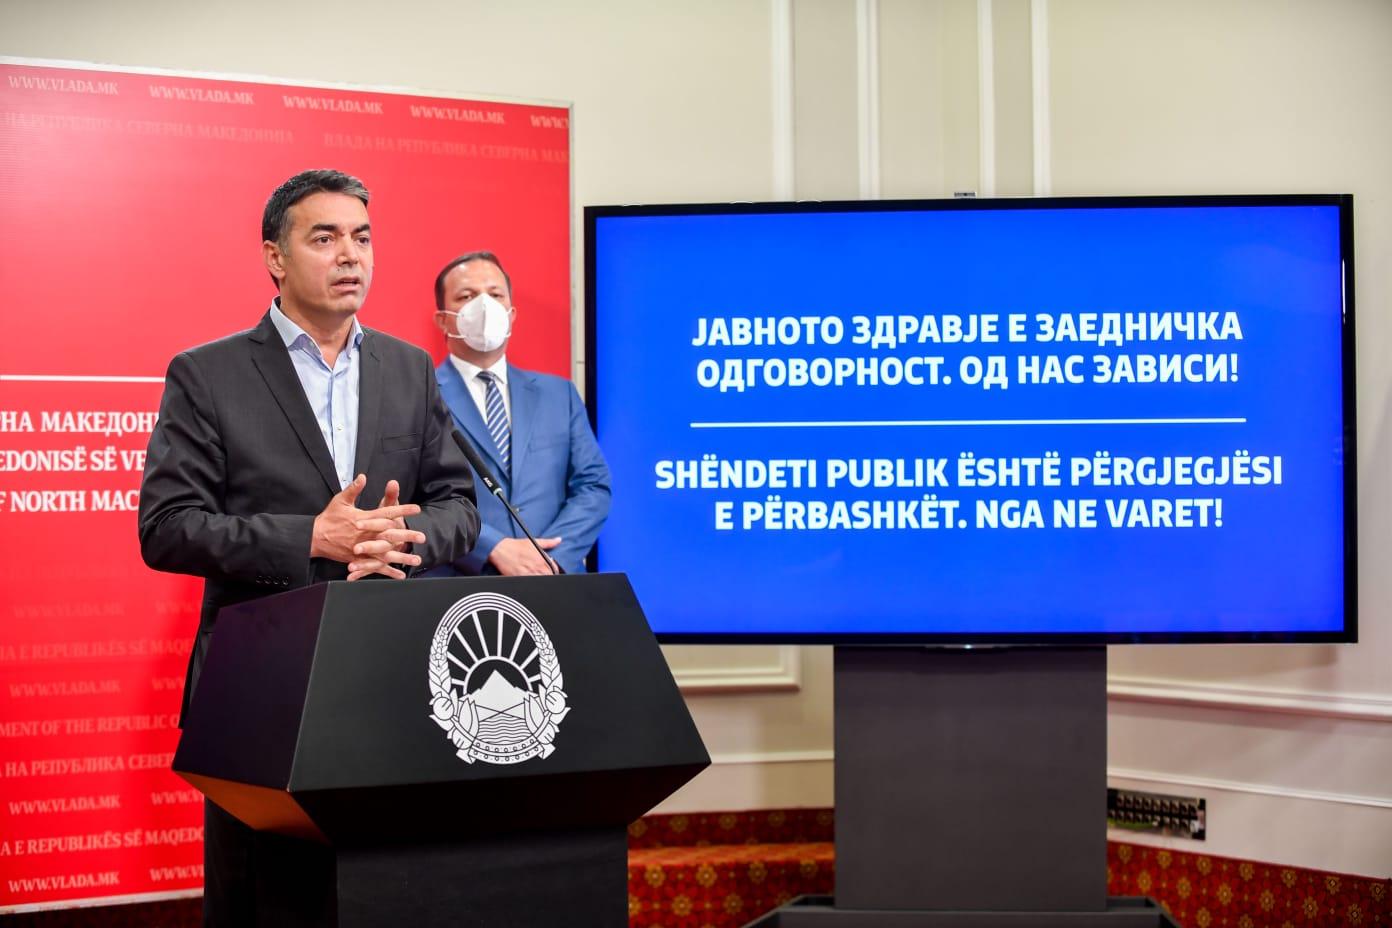 Severna Makedonija: Spasovski i Dimitrov potvrdili spremnost zemlje za pregovore o pristupanju